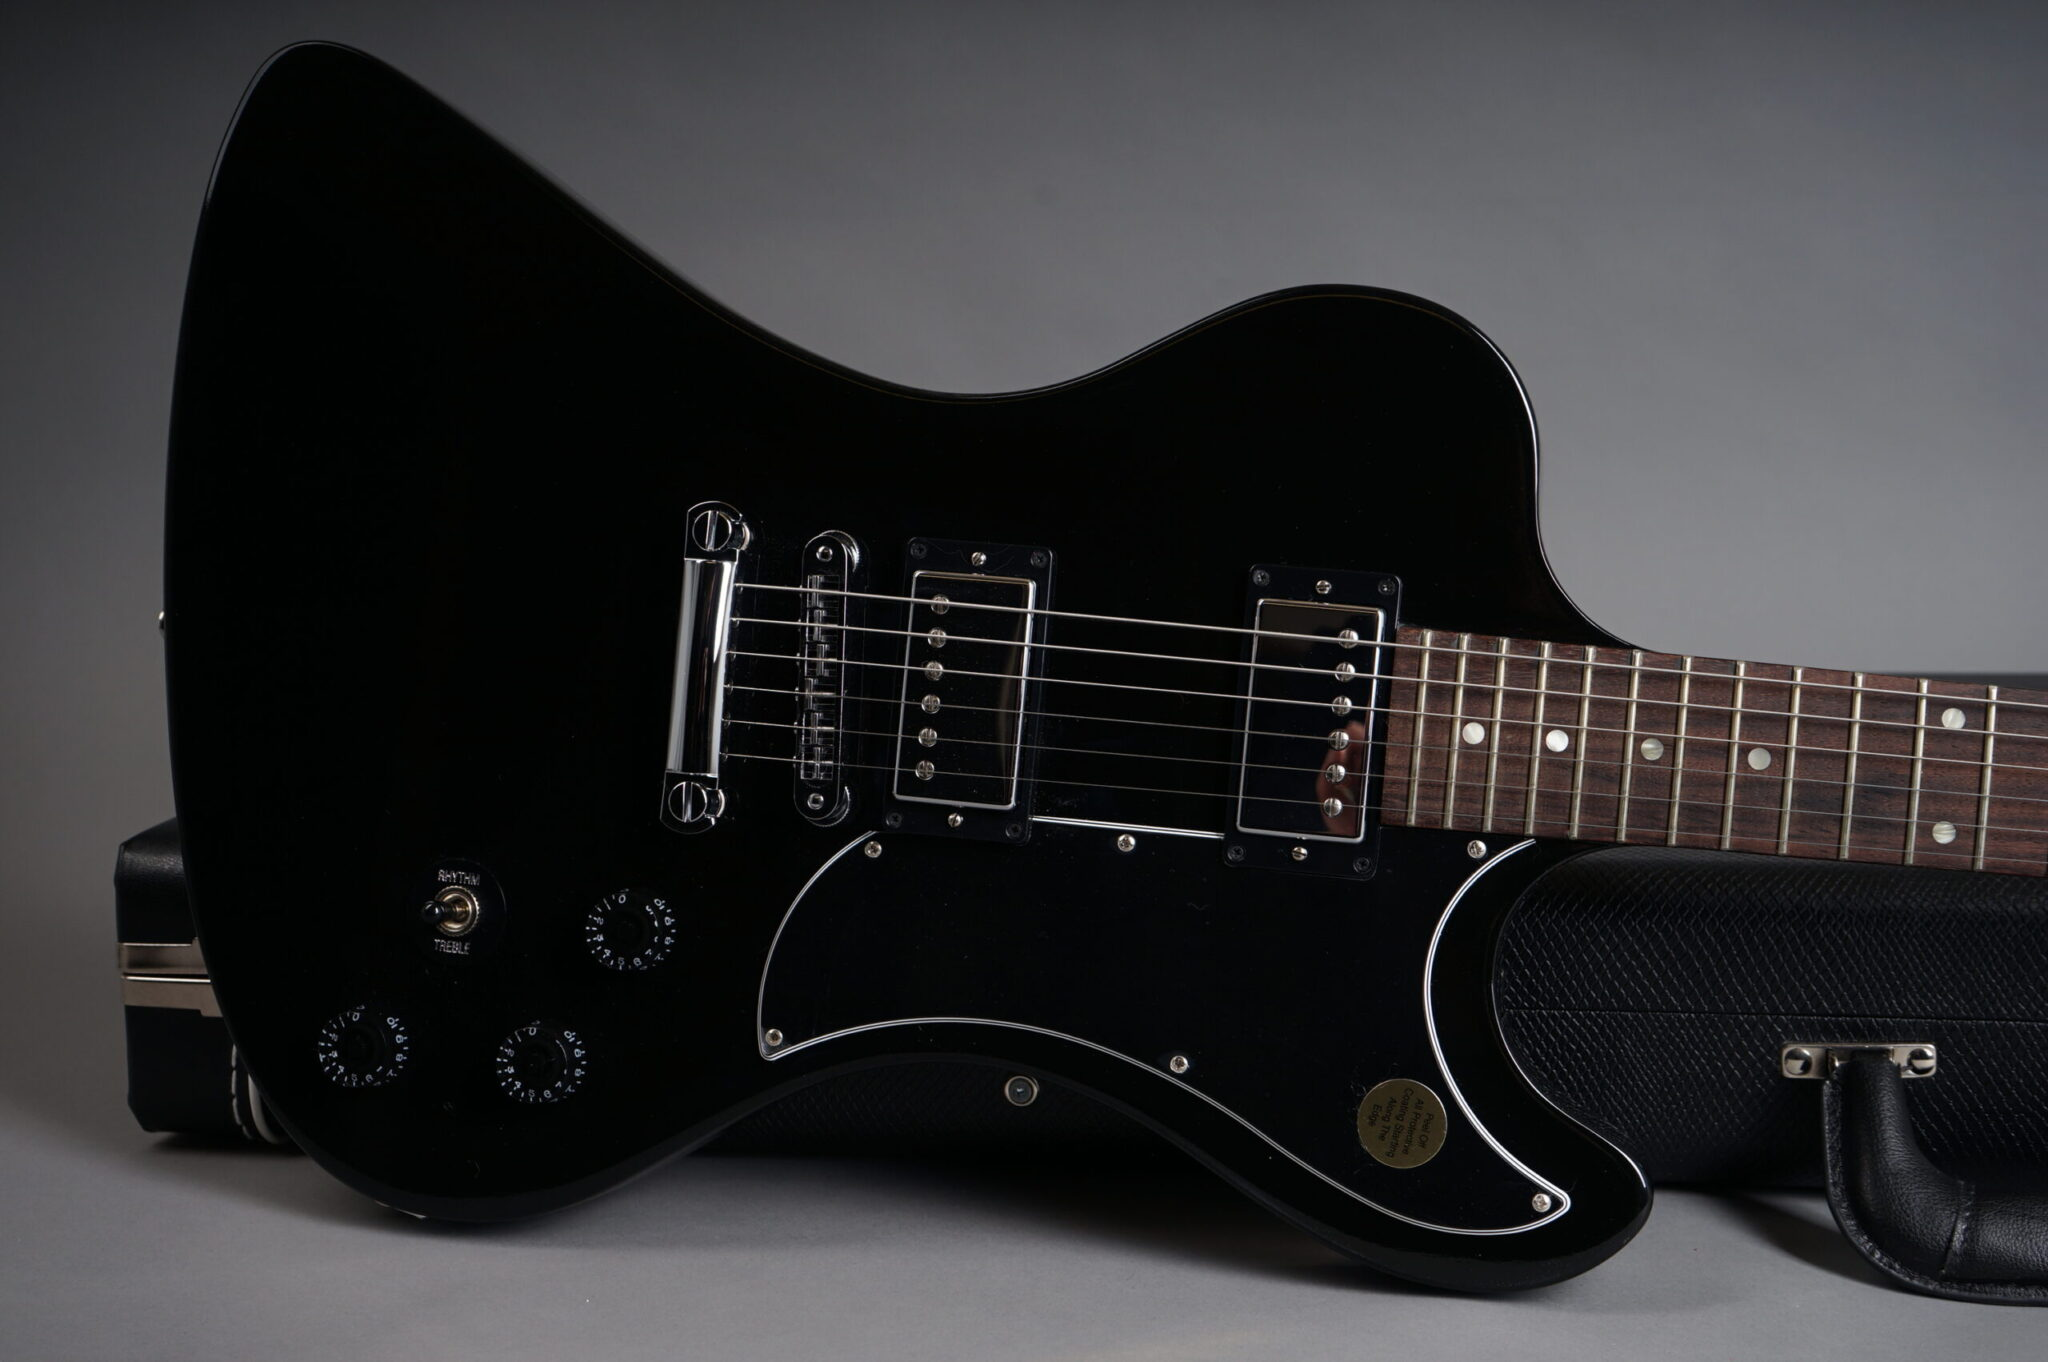 https://guitarpoint.de/app/uploads/products/2009-gibson-rd-standard-reissue-ebony/2009-Gibson-RD-Standard-Black-030290549-8-scaled-2048x1362.jpg